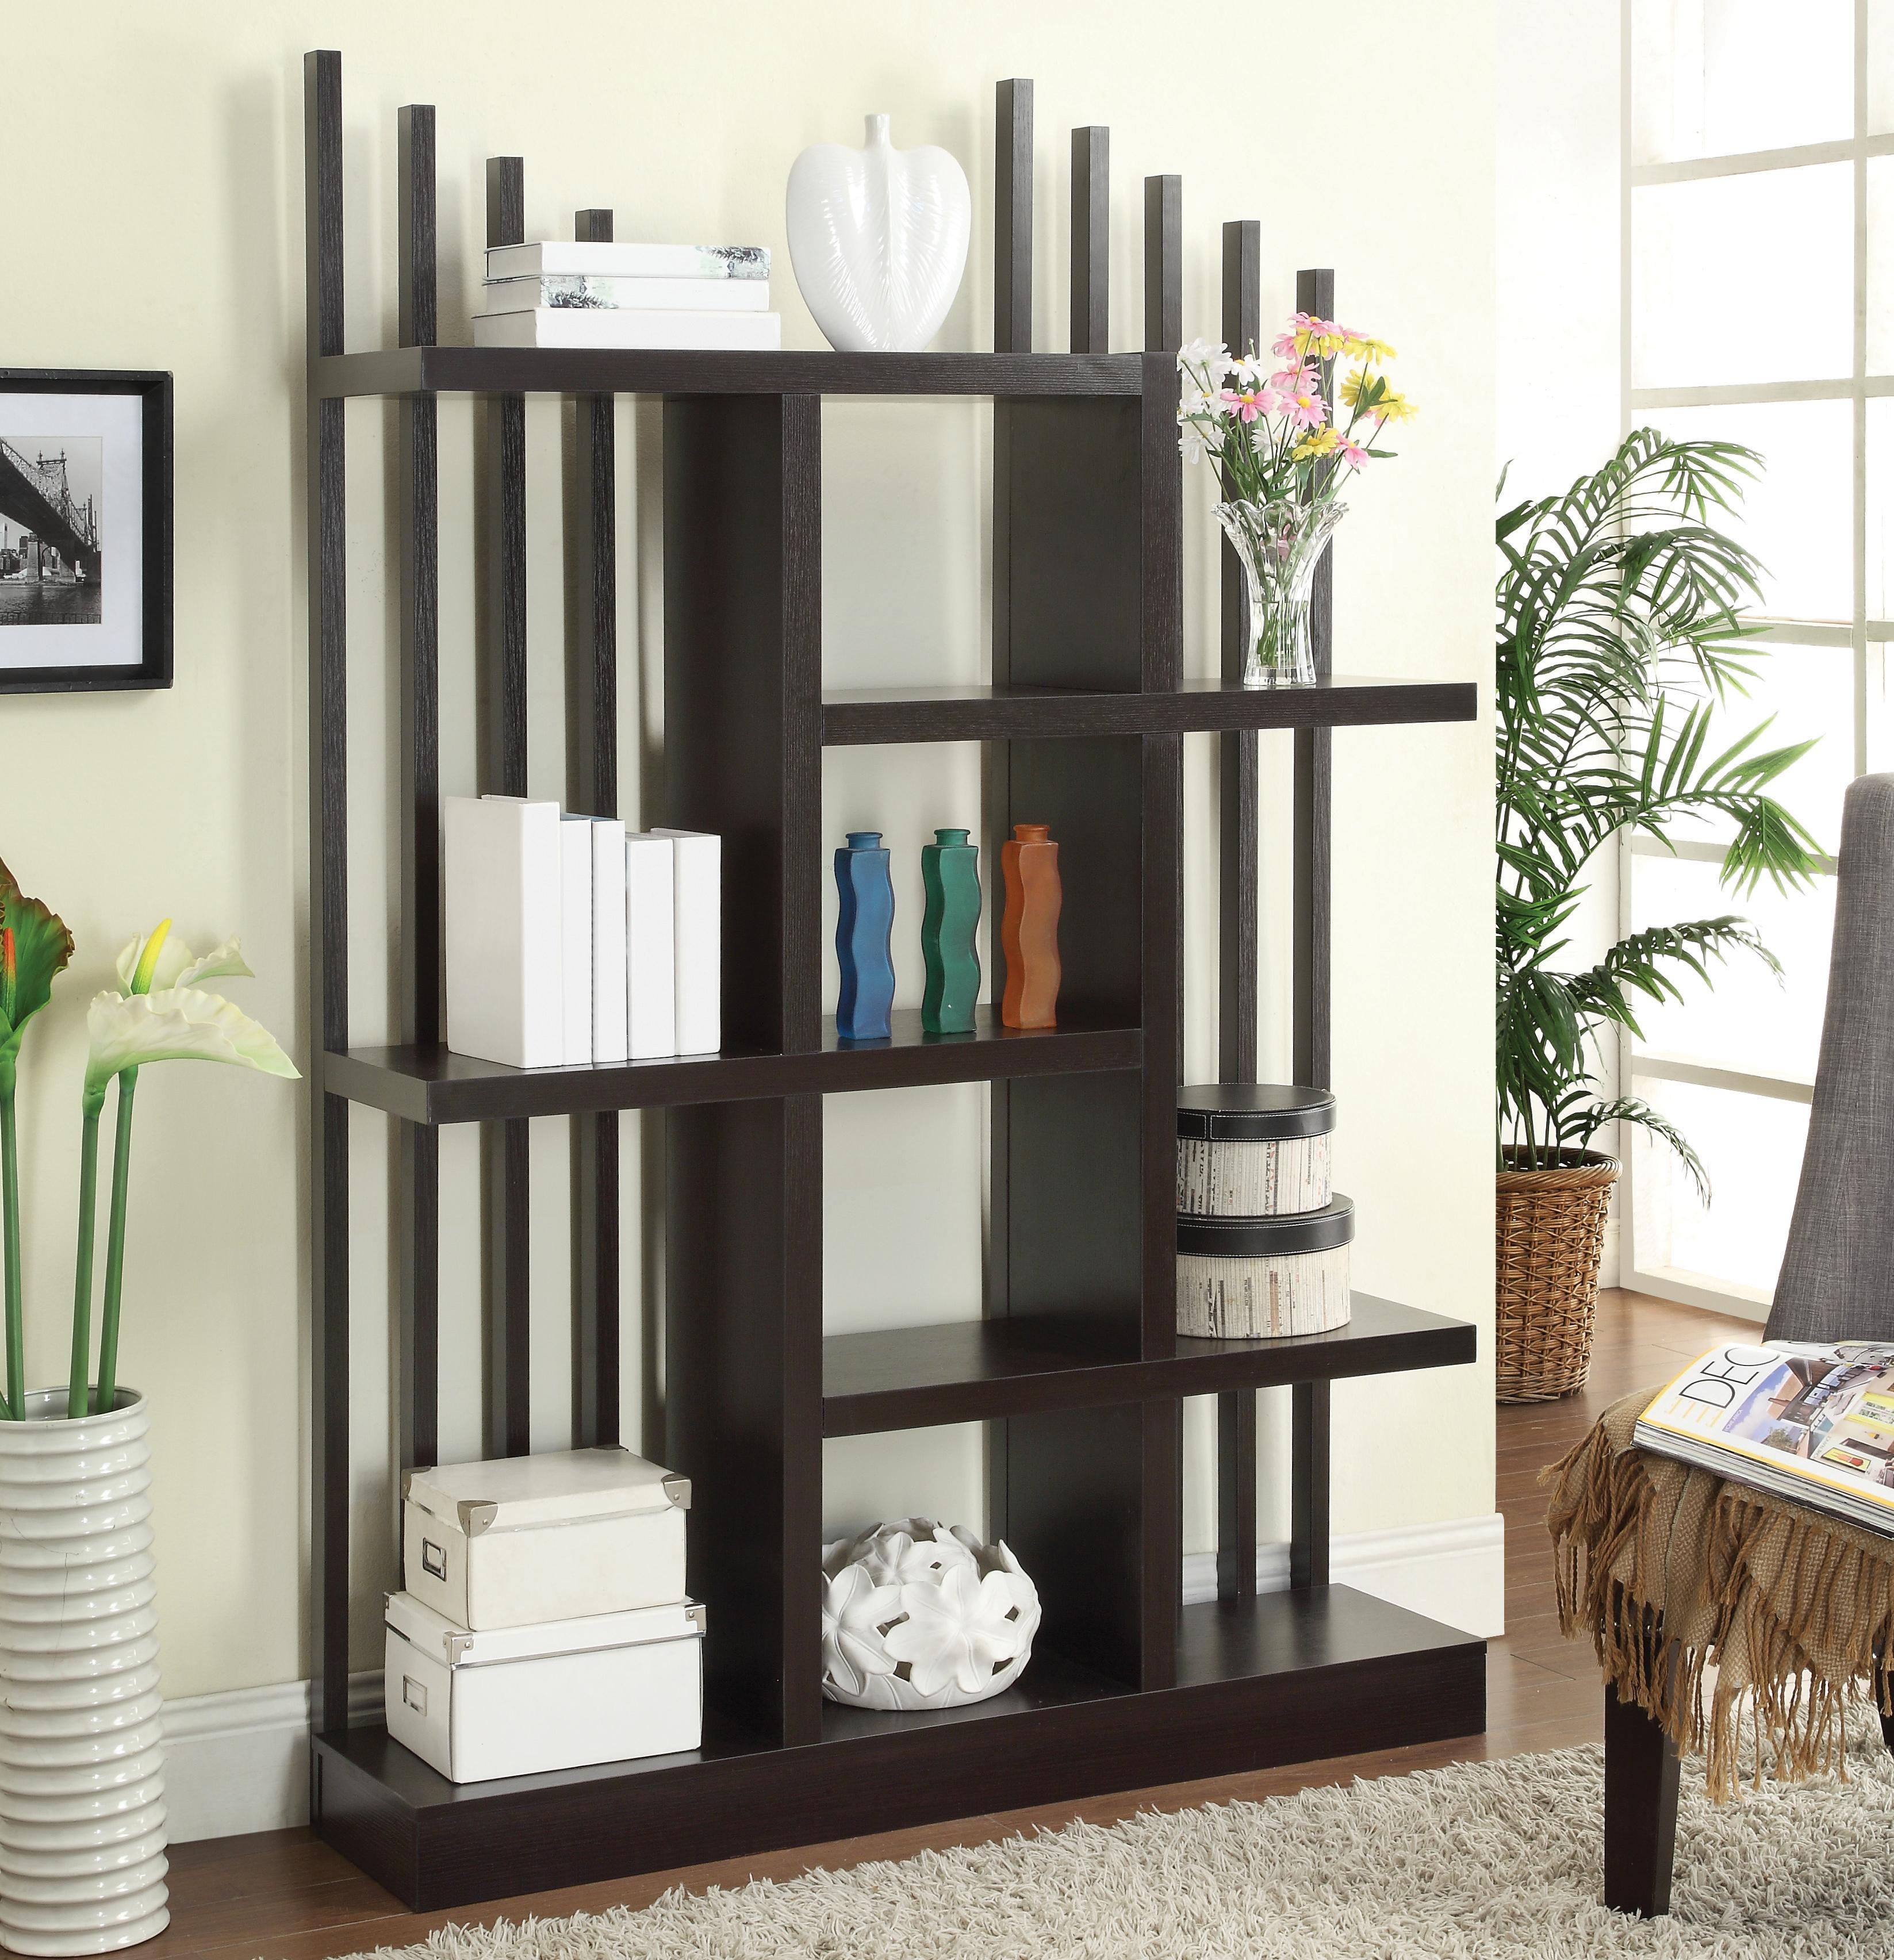 Coaster Bookcases Bookshelf - Item Number: 801177